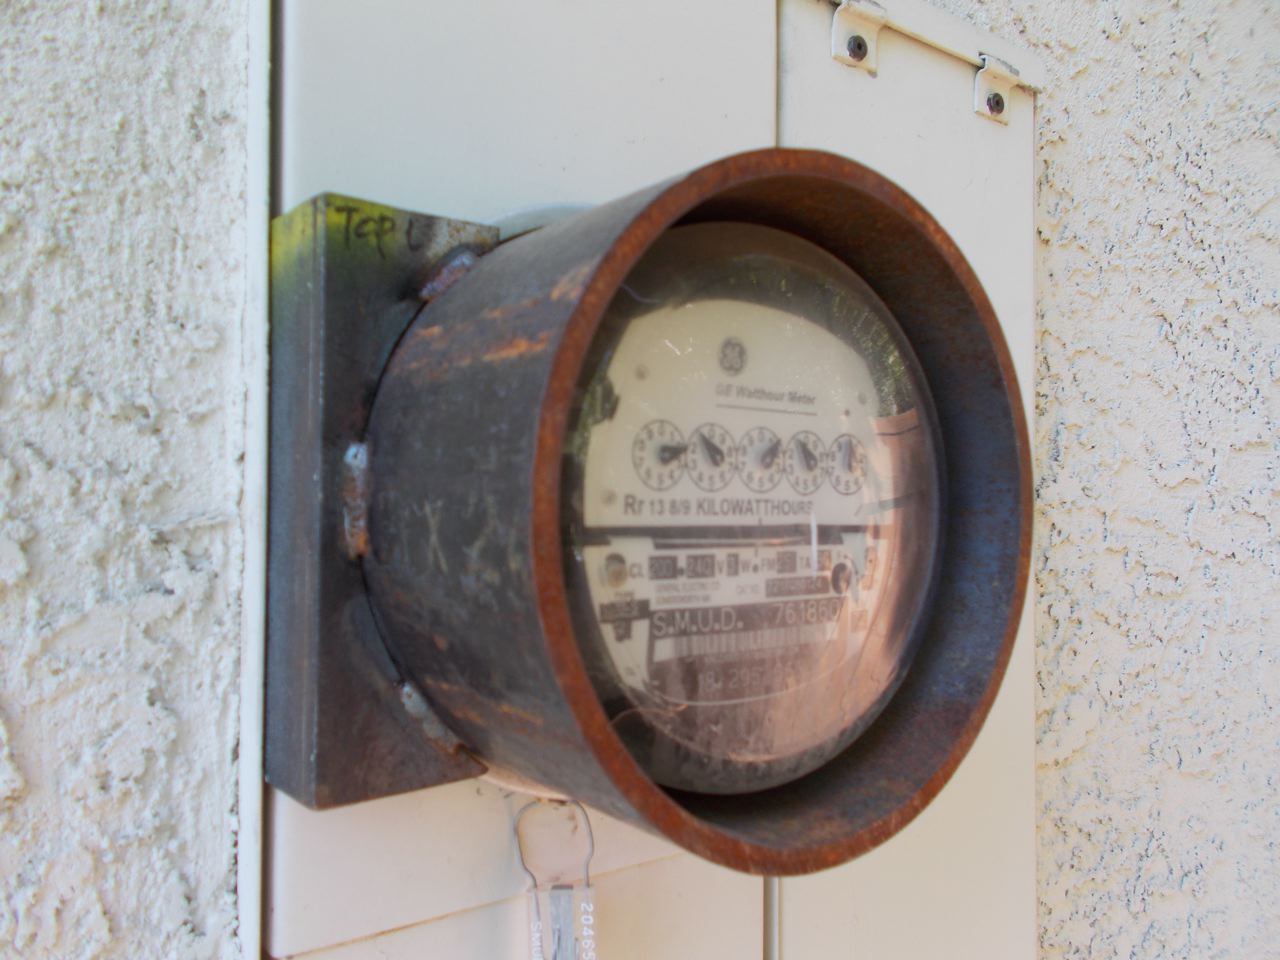 Analogue Meter Vs Smart Meters : 'old ironsides provides a secure analog meter defense